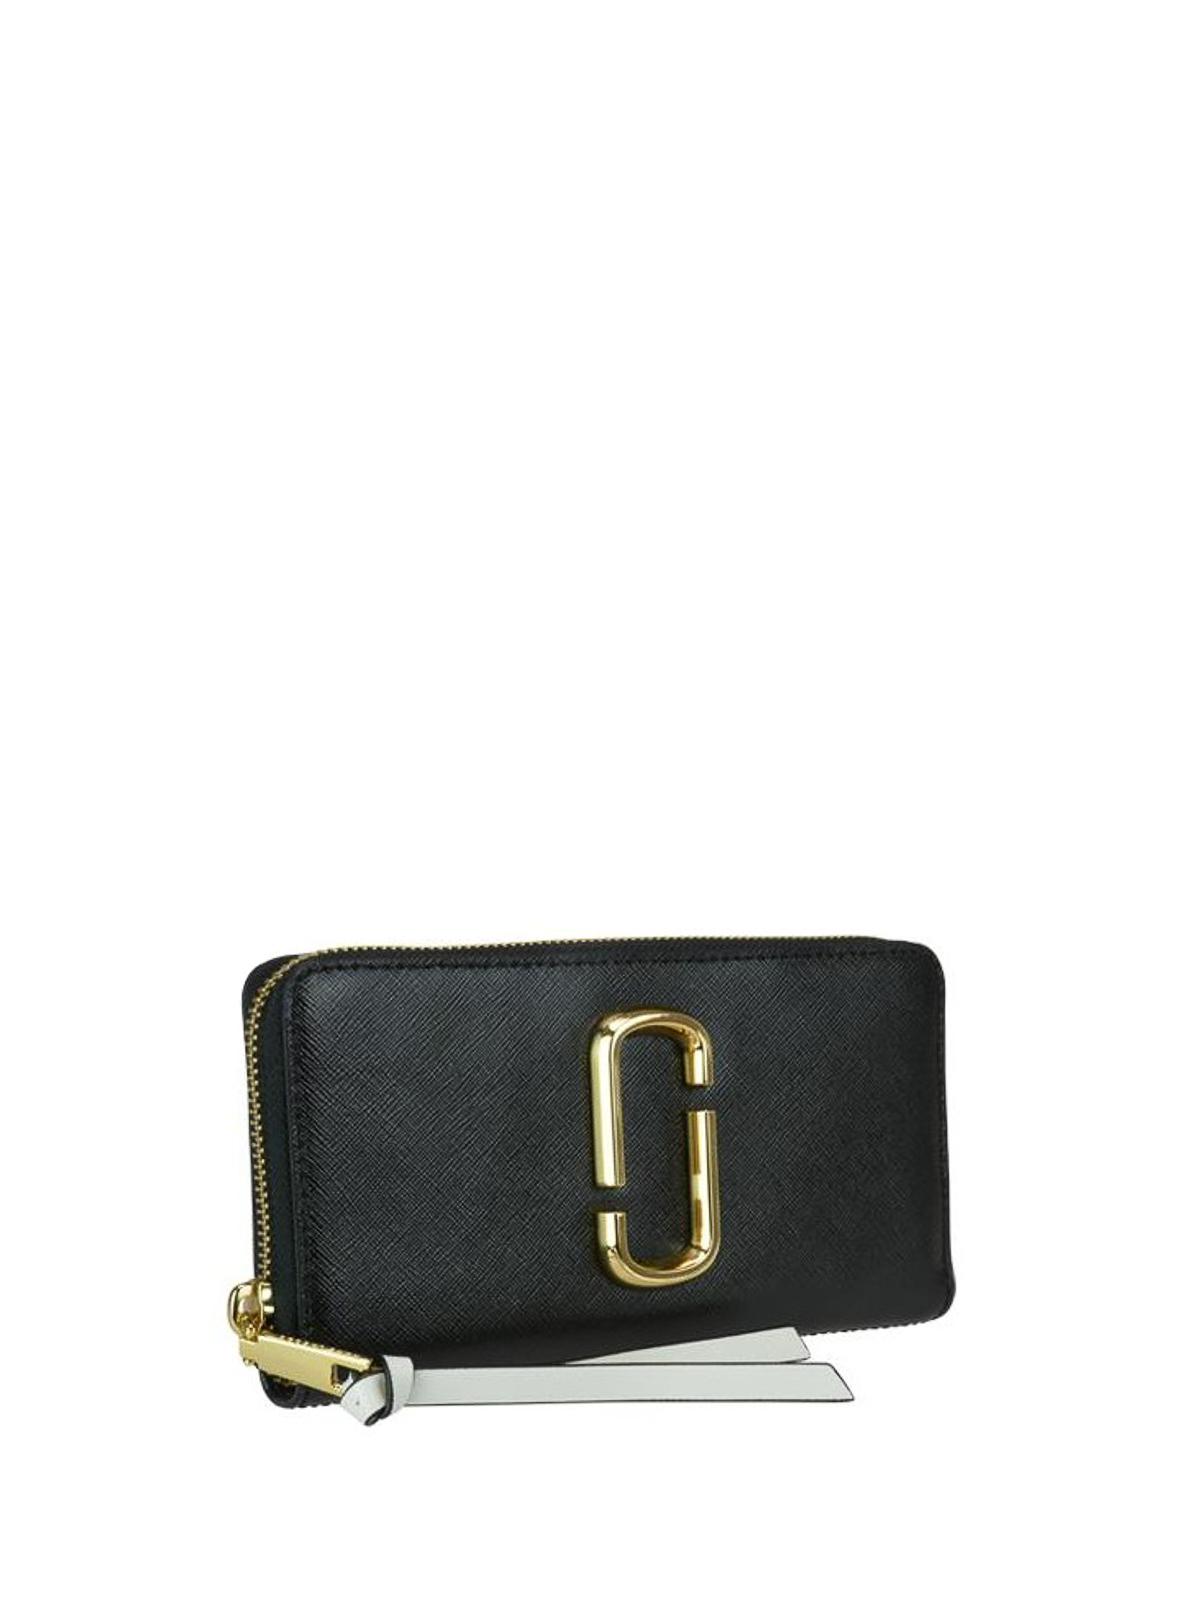 42e23b4df5 MARC JACOBS: wallets & purses online - Snapshot Standard black wallet